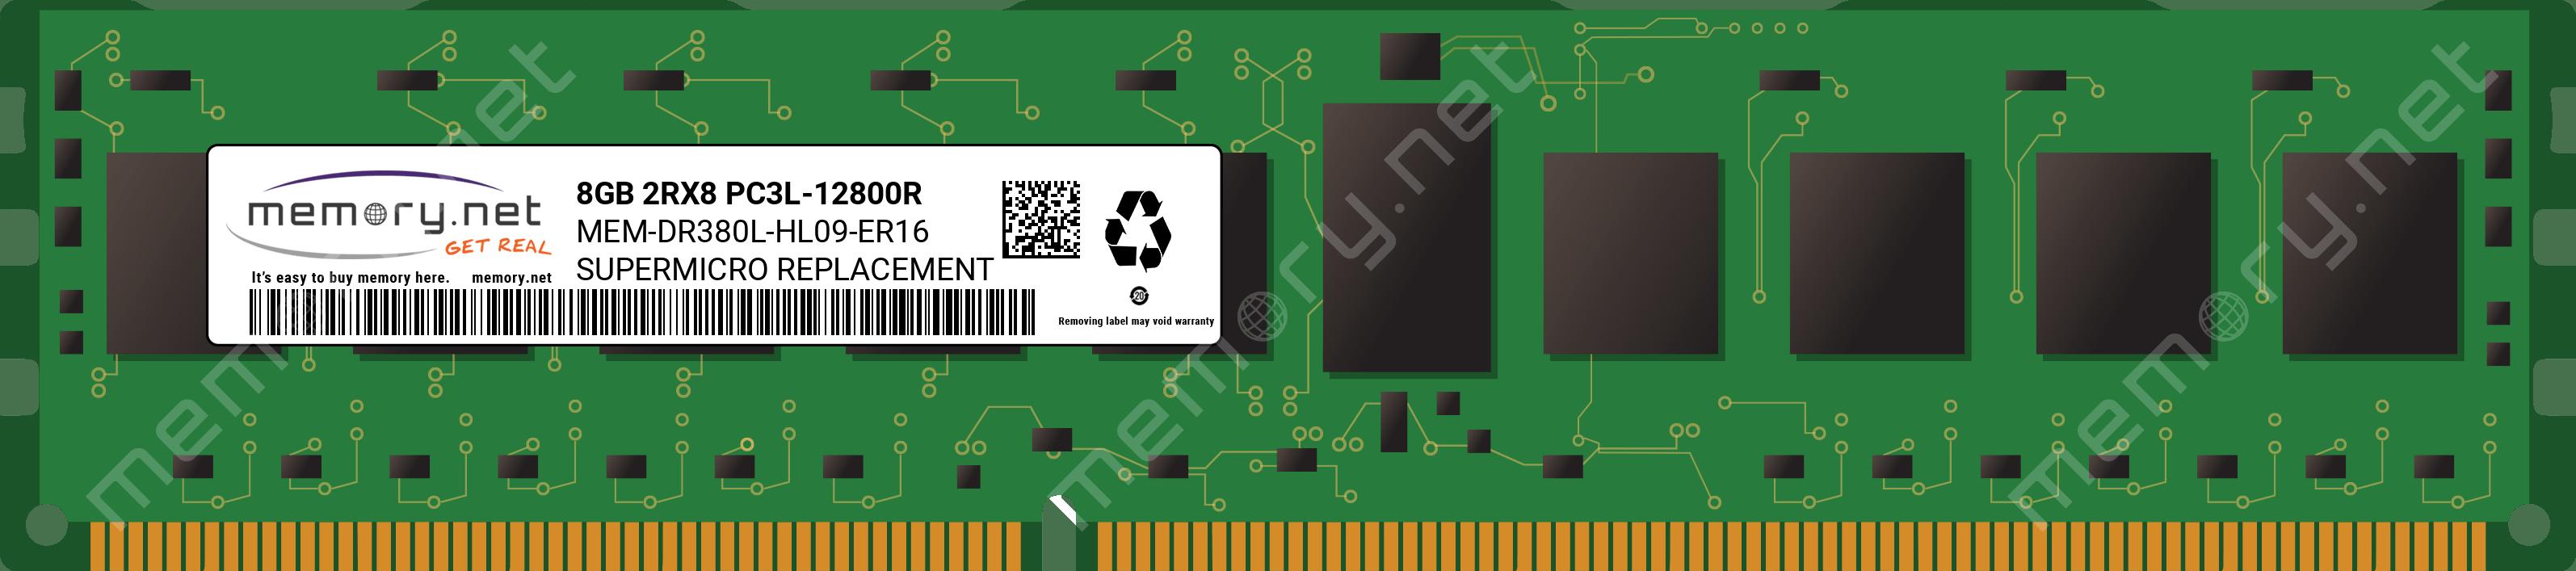 Hynix HMT41GR7DFR8A-PB 8GB DDR3-1600 ECC REG